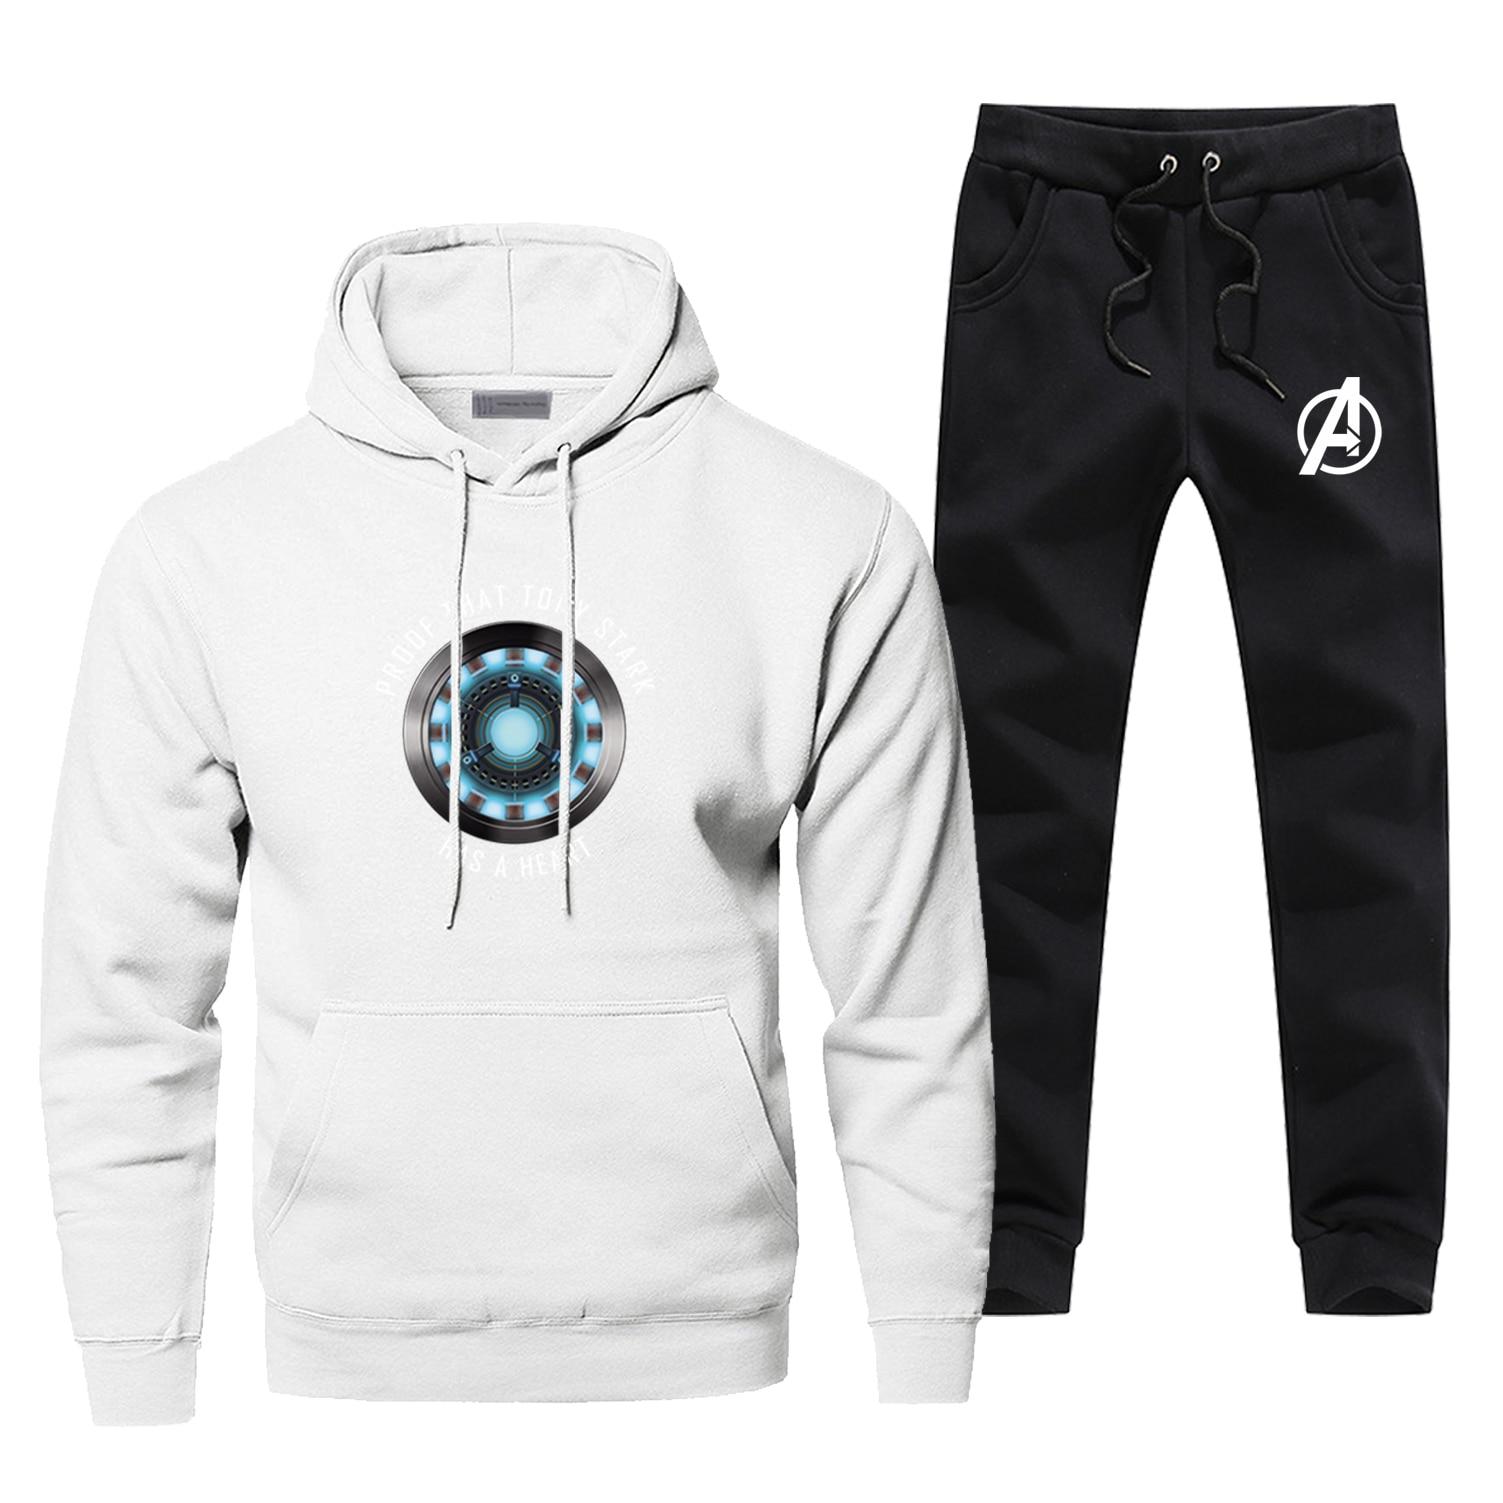 Iron Man Hoodies Cosplay Men's Sets Tony Stark Avengers Complete Man Tracksuit Casual Fashion Hip Hop Pants Sweatshirts Hoodie